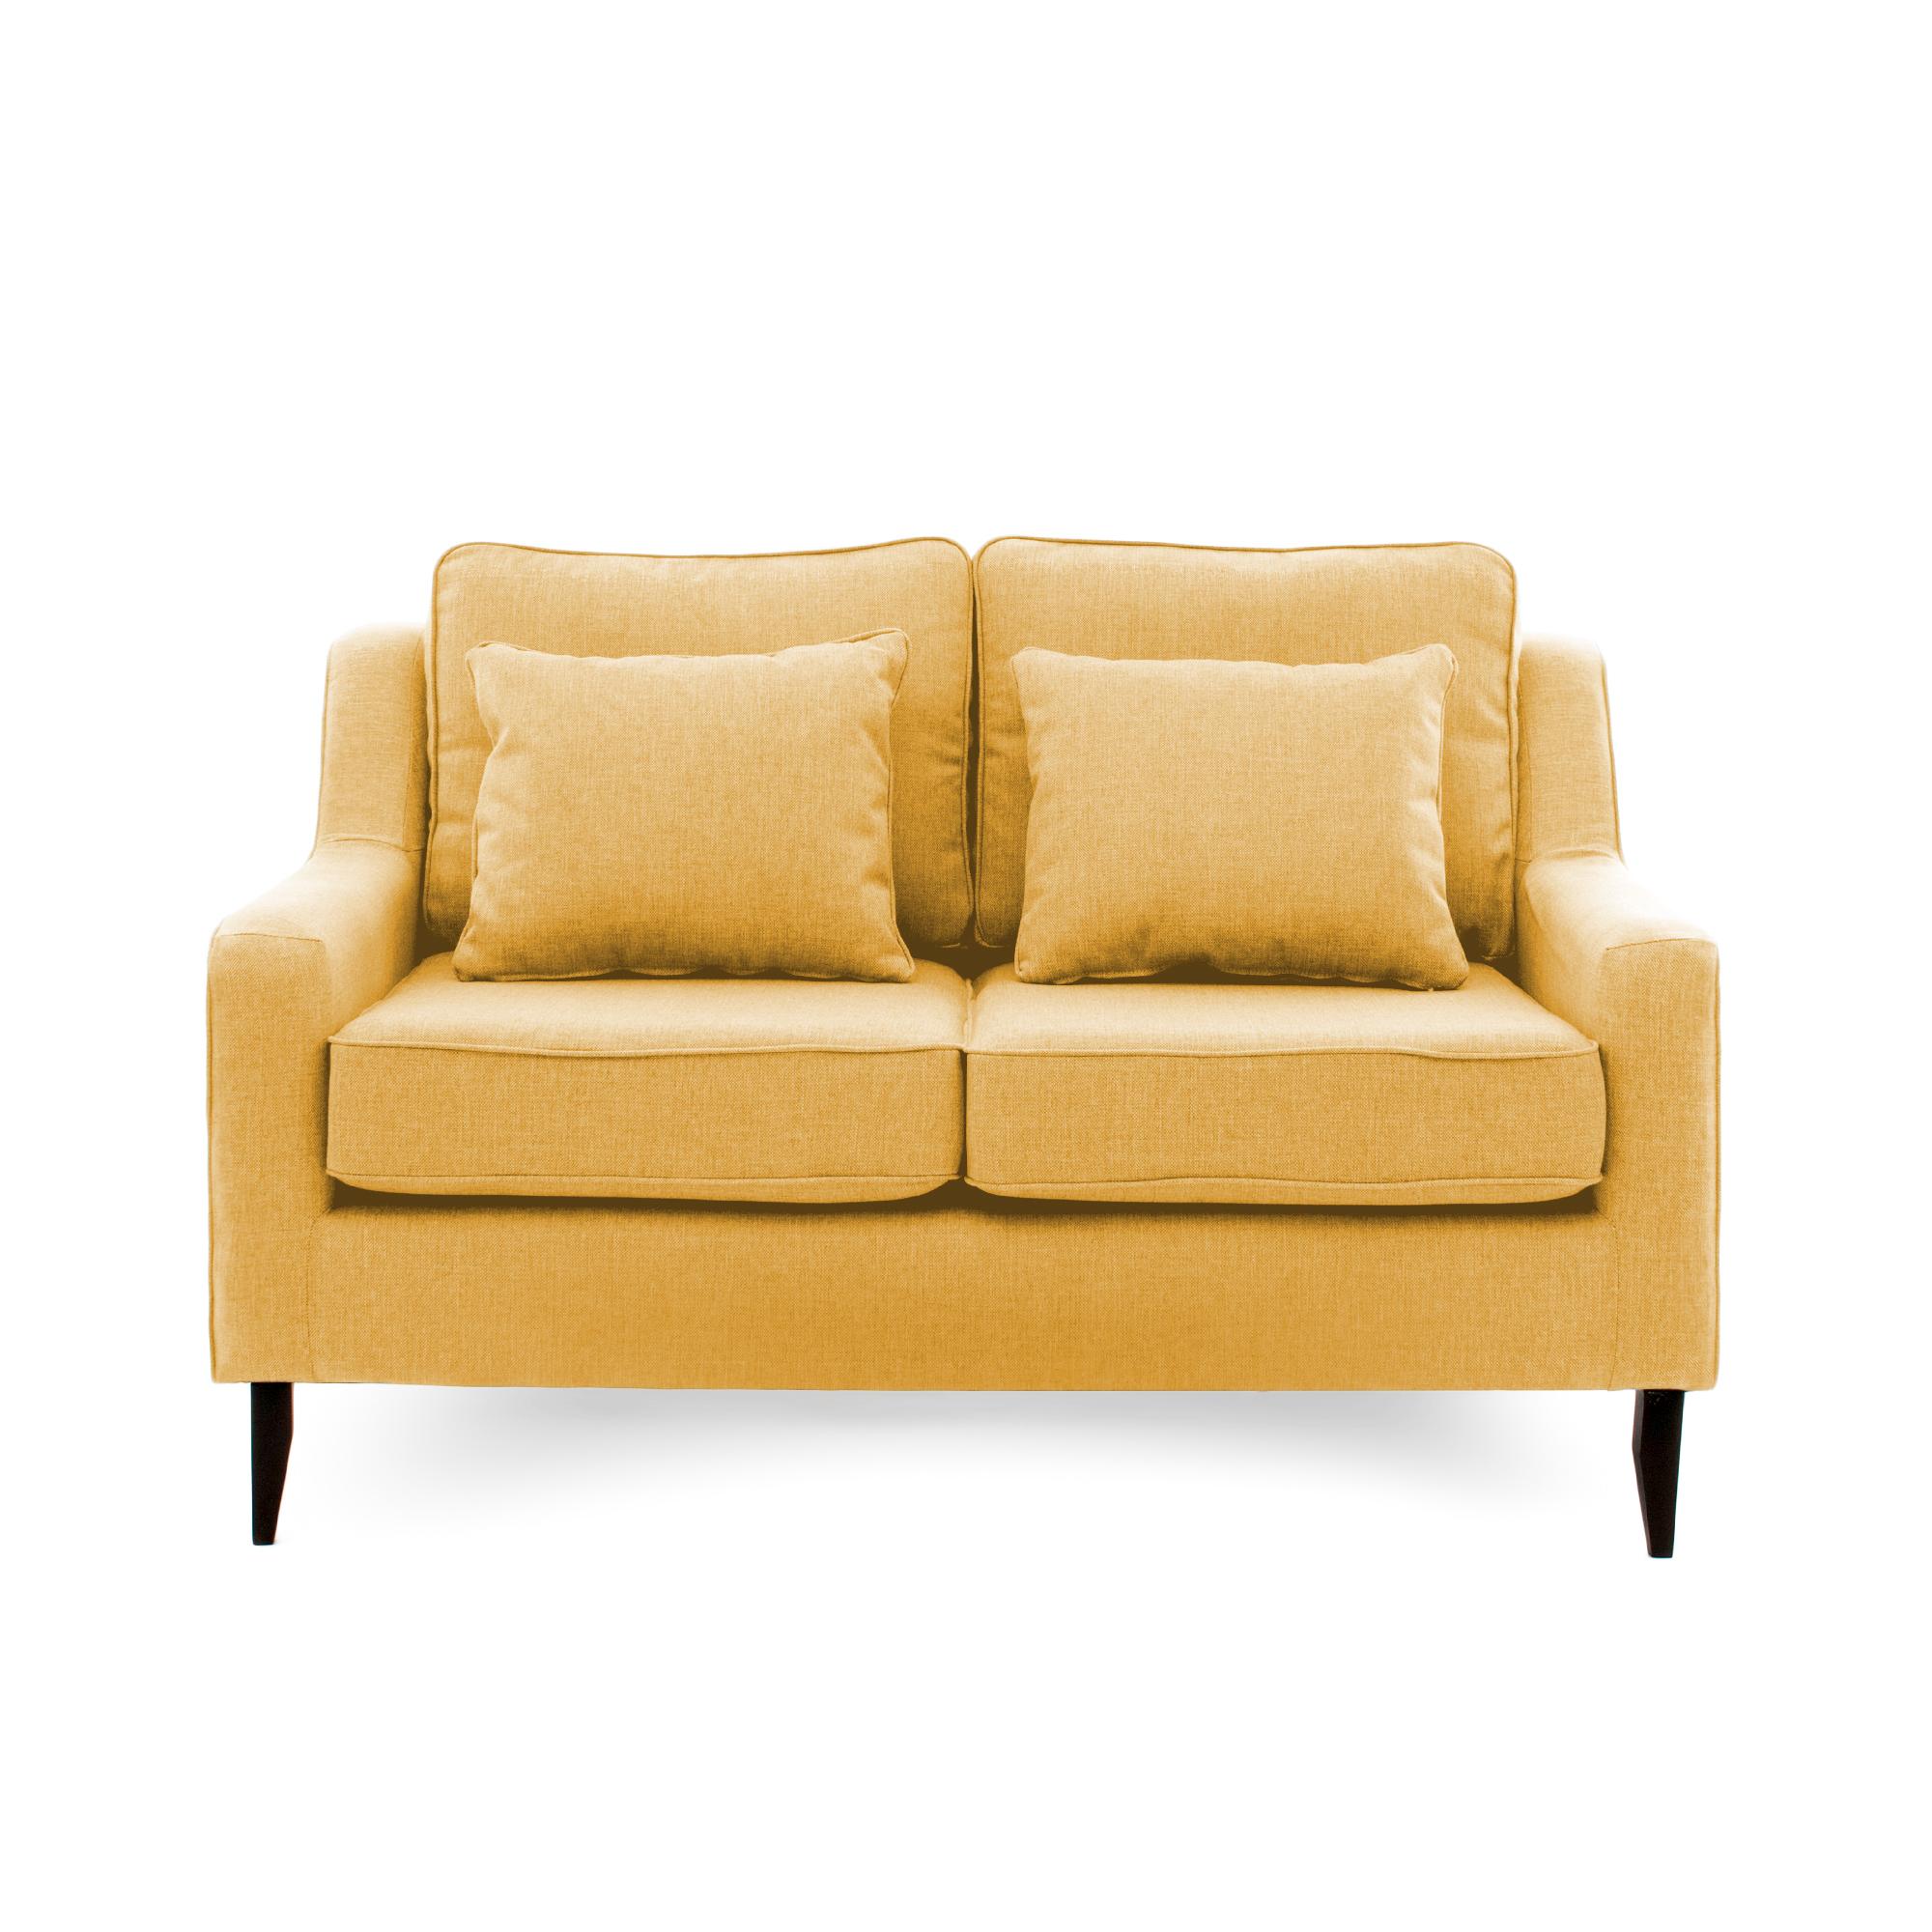 Canapea Fixa 2 locuri Bond Mustard